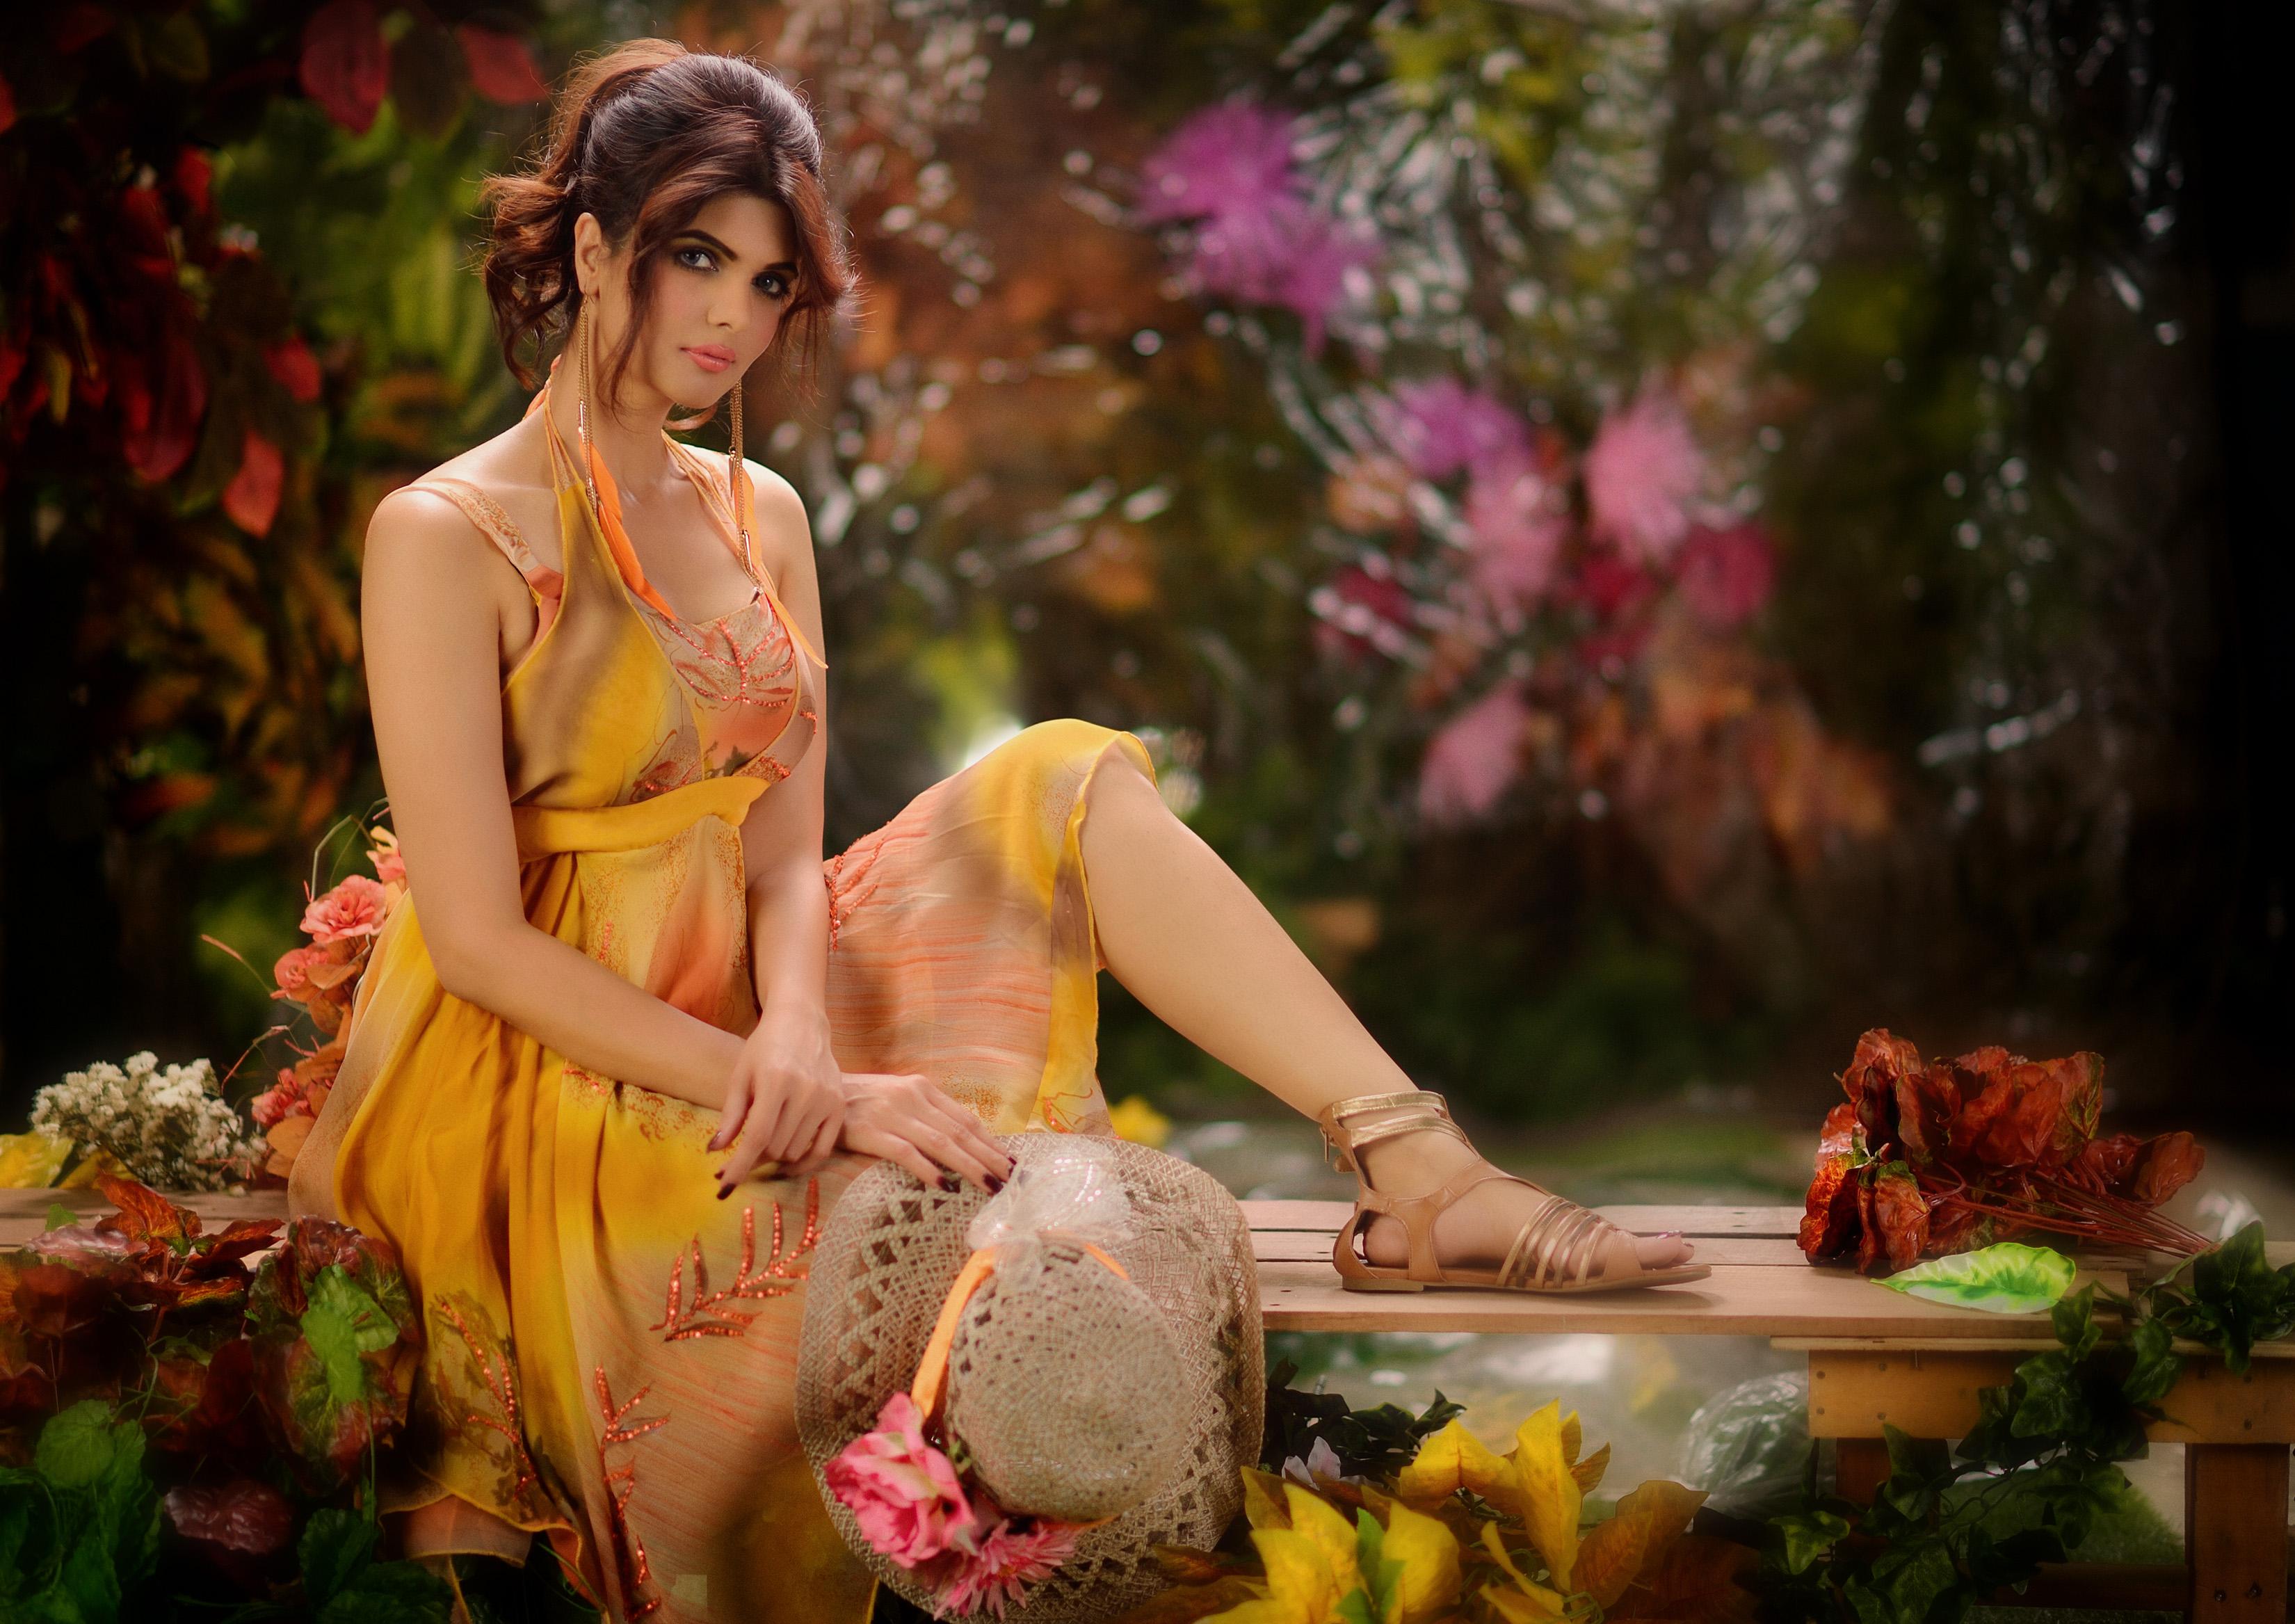 indian women models wallpapers - photo #11